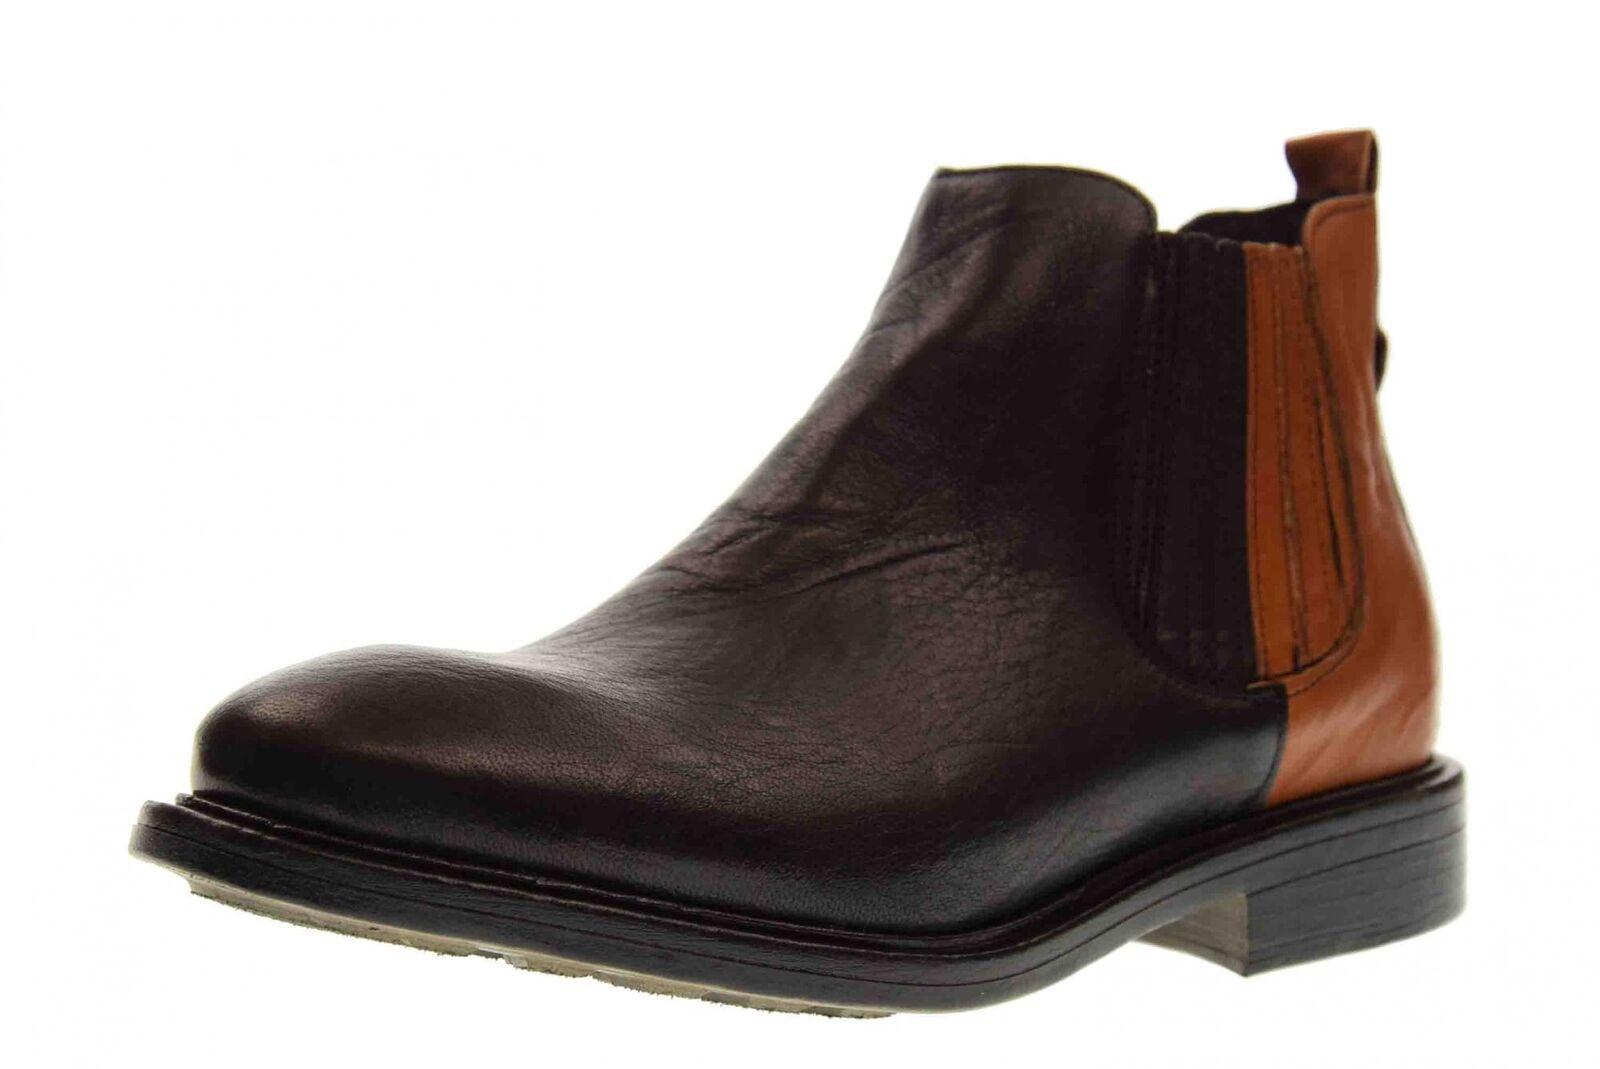 Creative A18f chaussures femme bottines BELLA 722 TERRY TERRY TERRY NOIR   CUIR 5e34c1